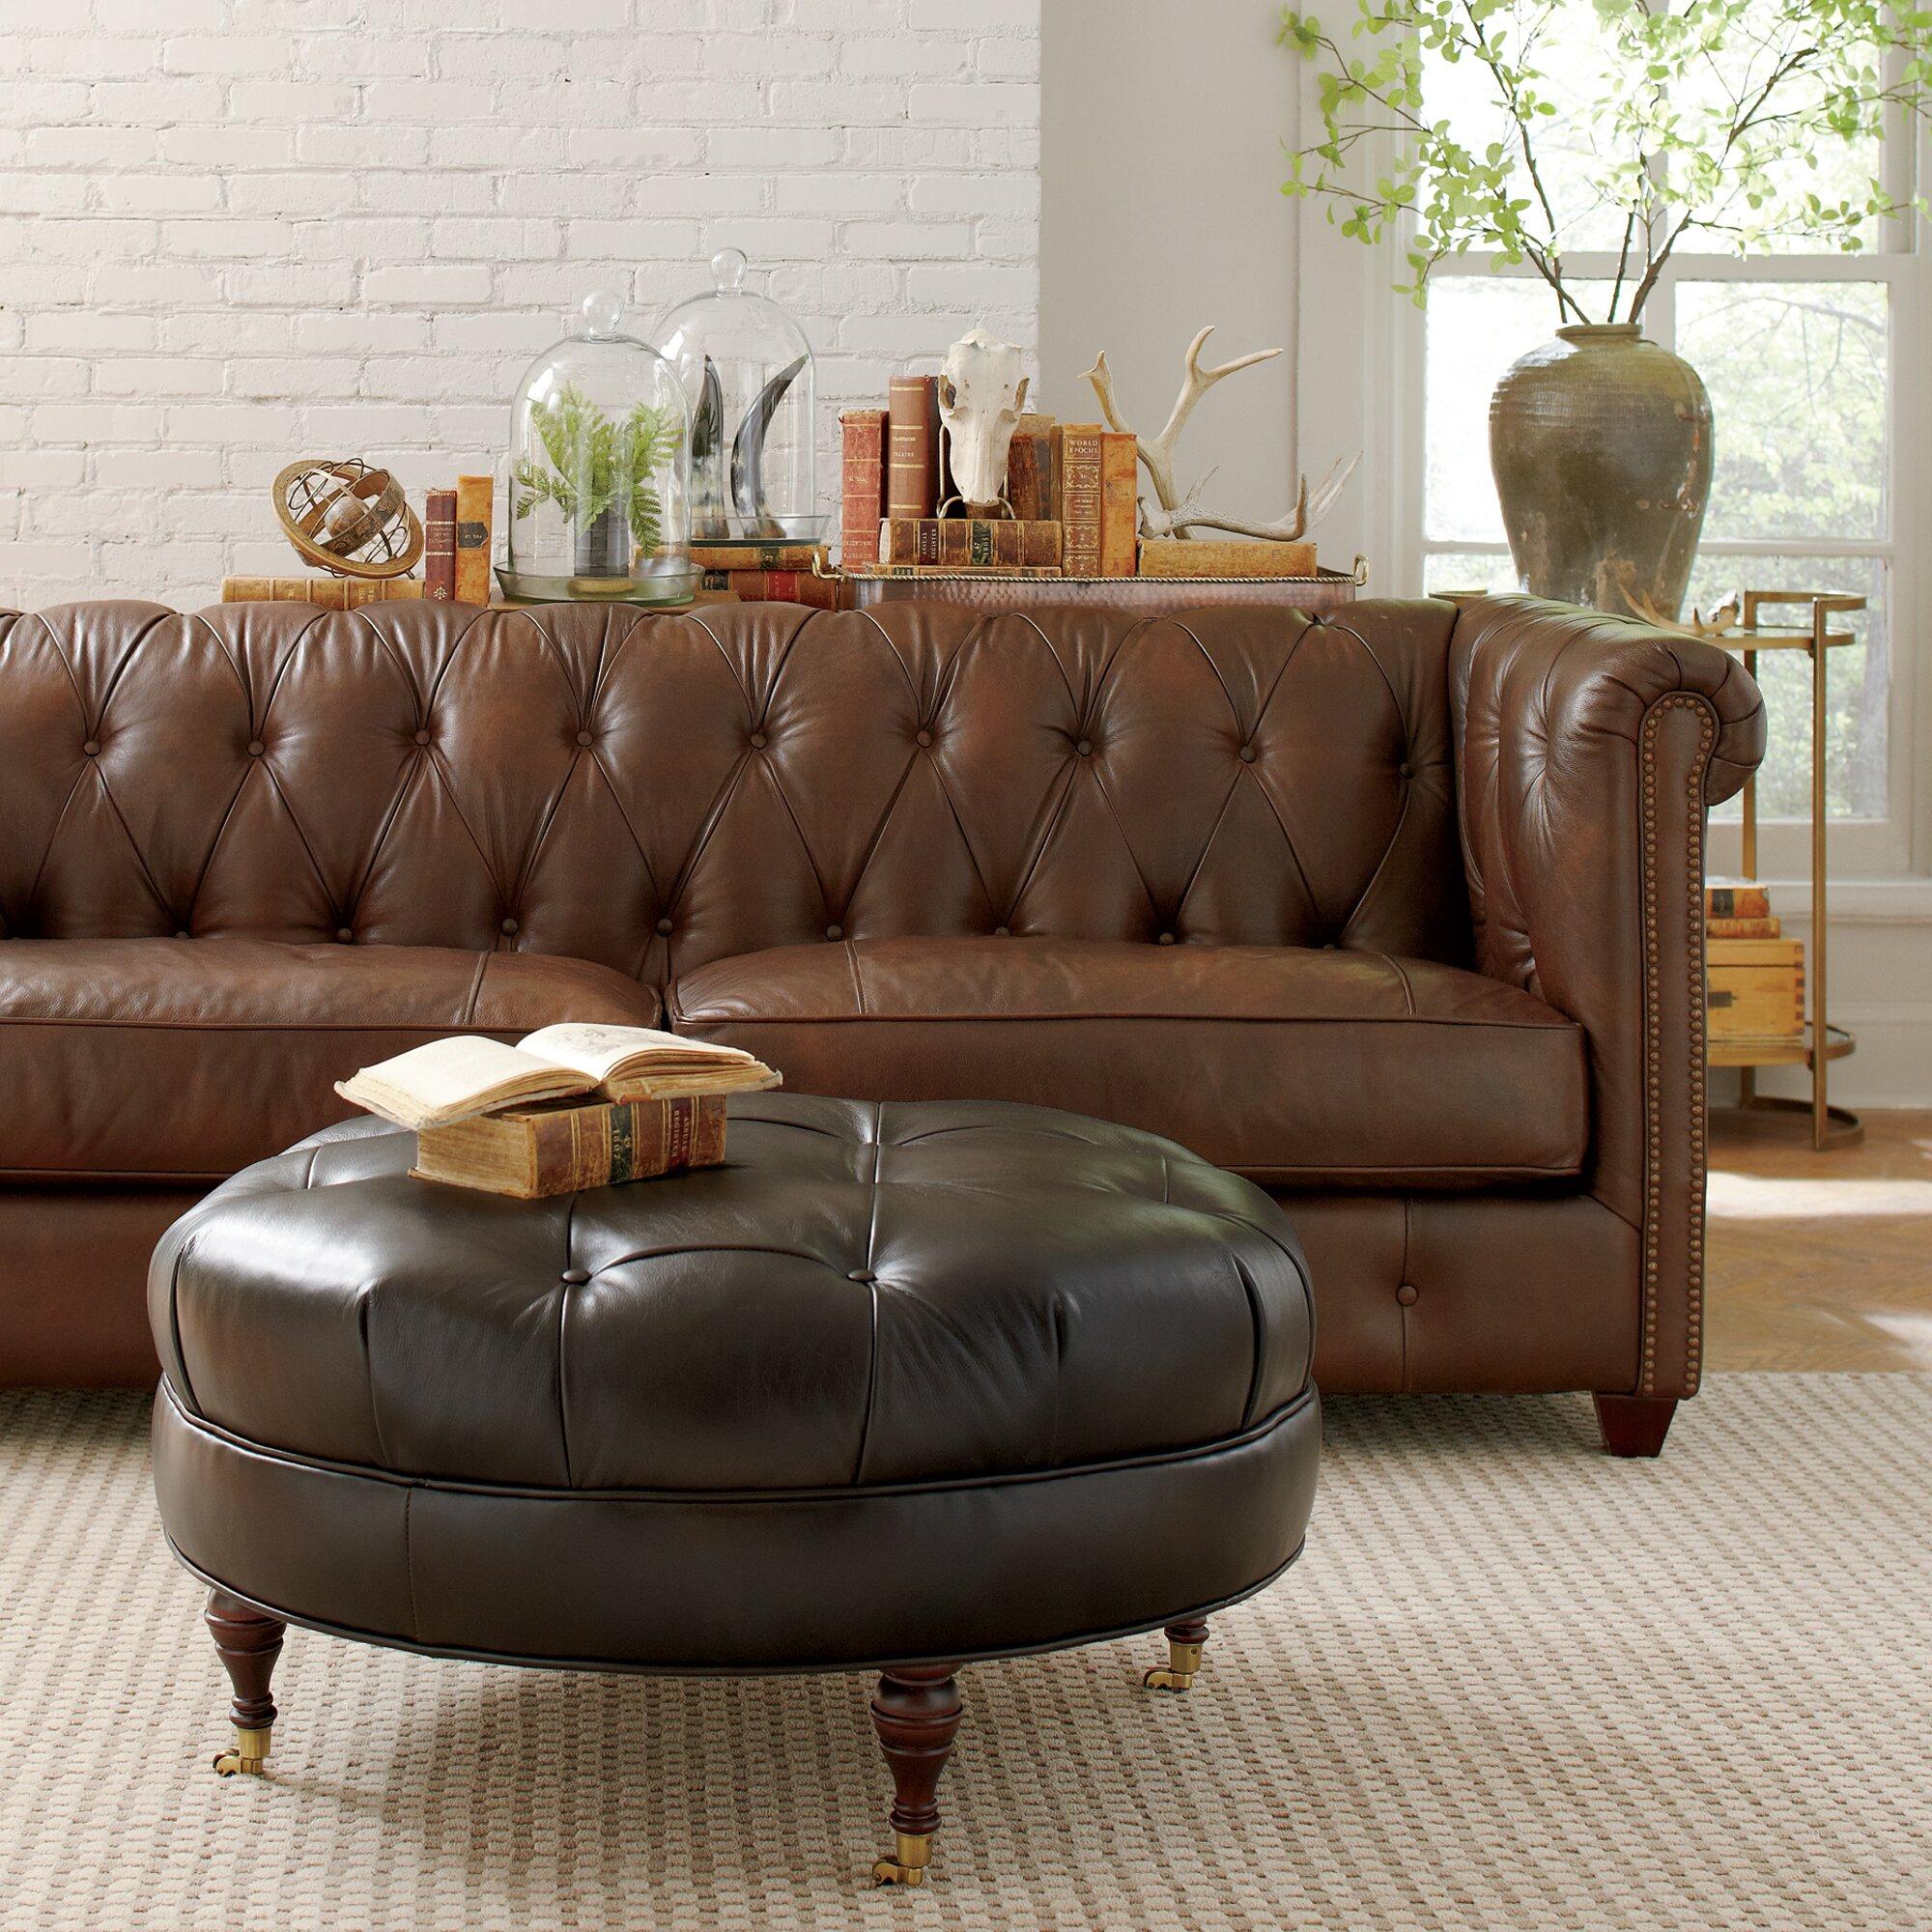 Beautiful Lane Leather sofa LANE LEATHER SOFA Birch Lane Hawthorn